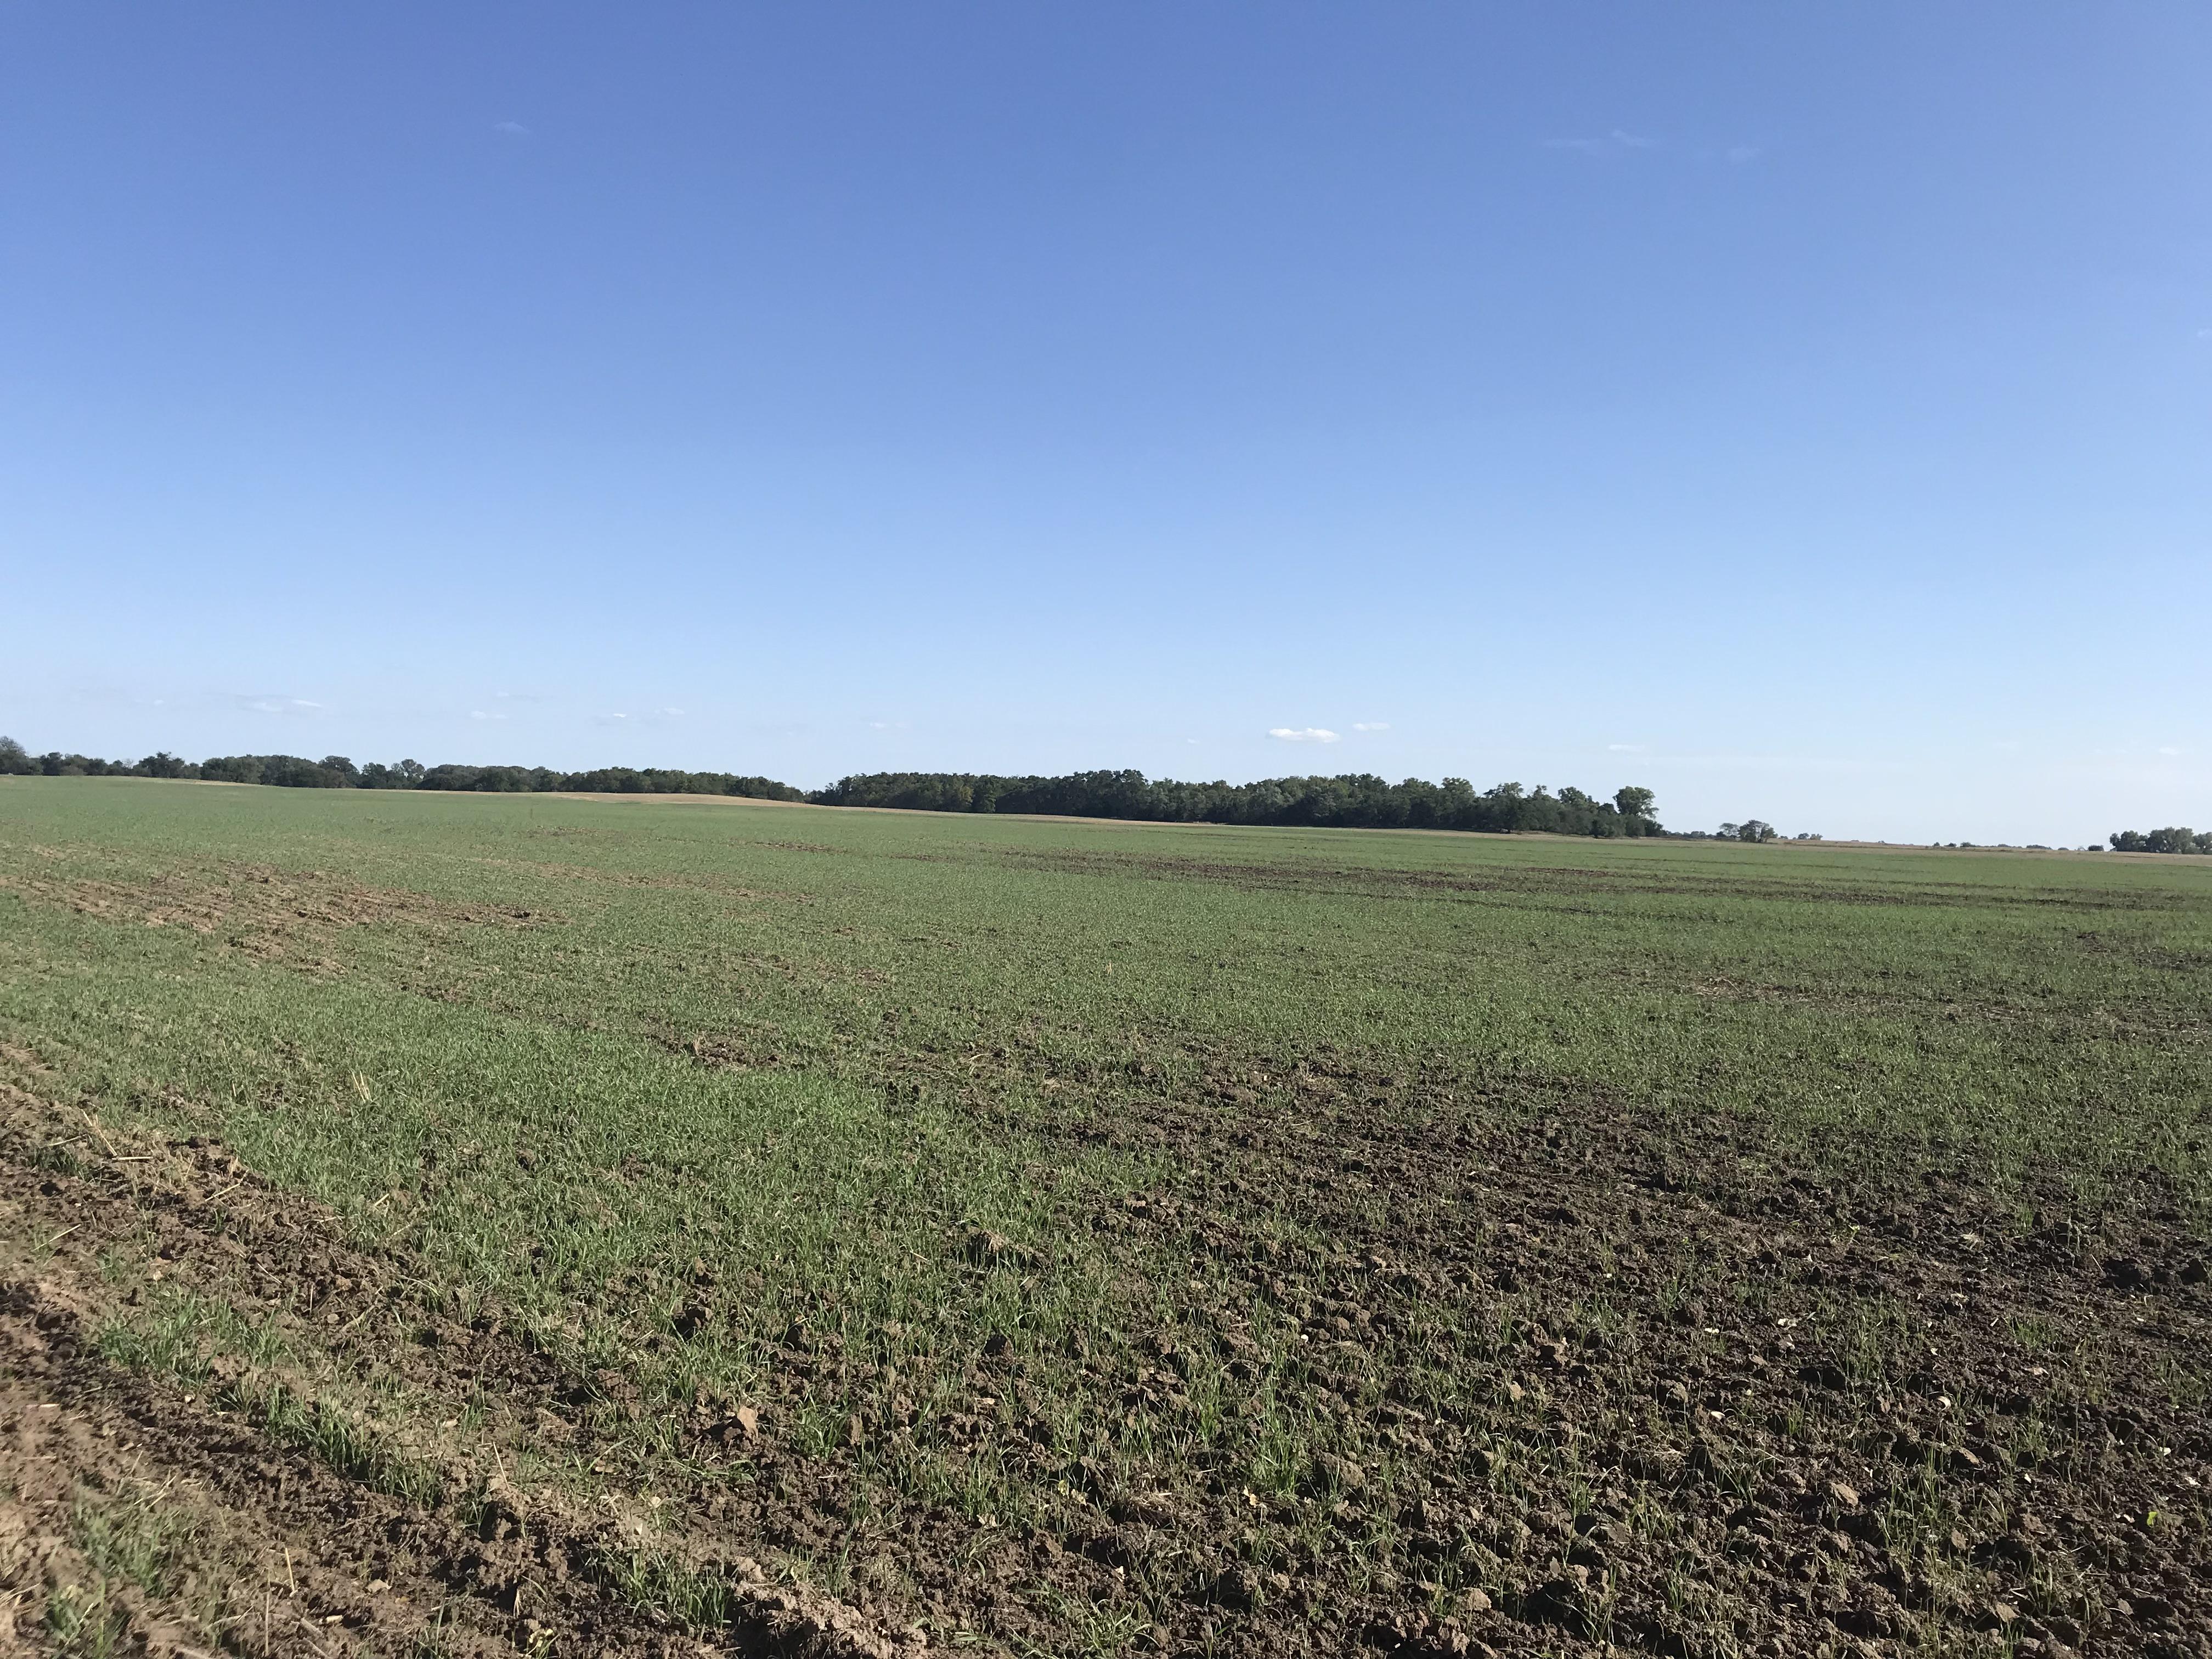 Planted-wheat-10-6-19-1.jpg